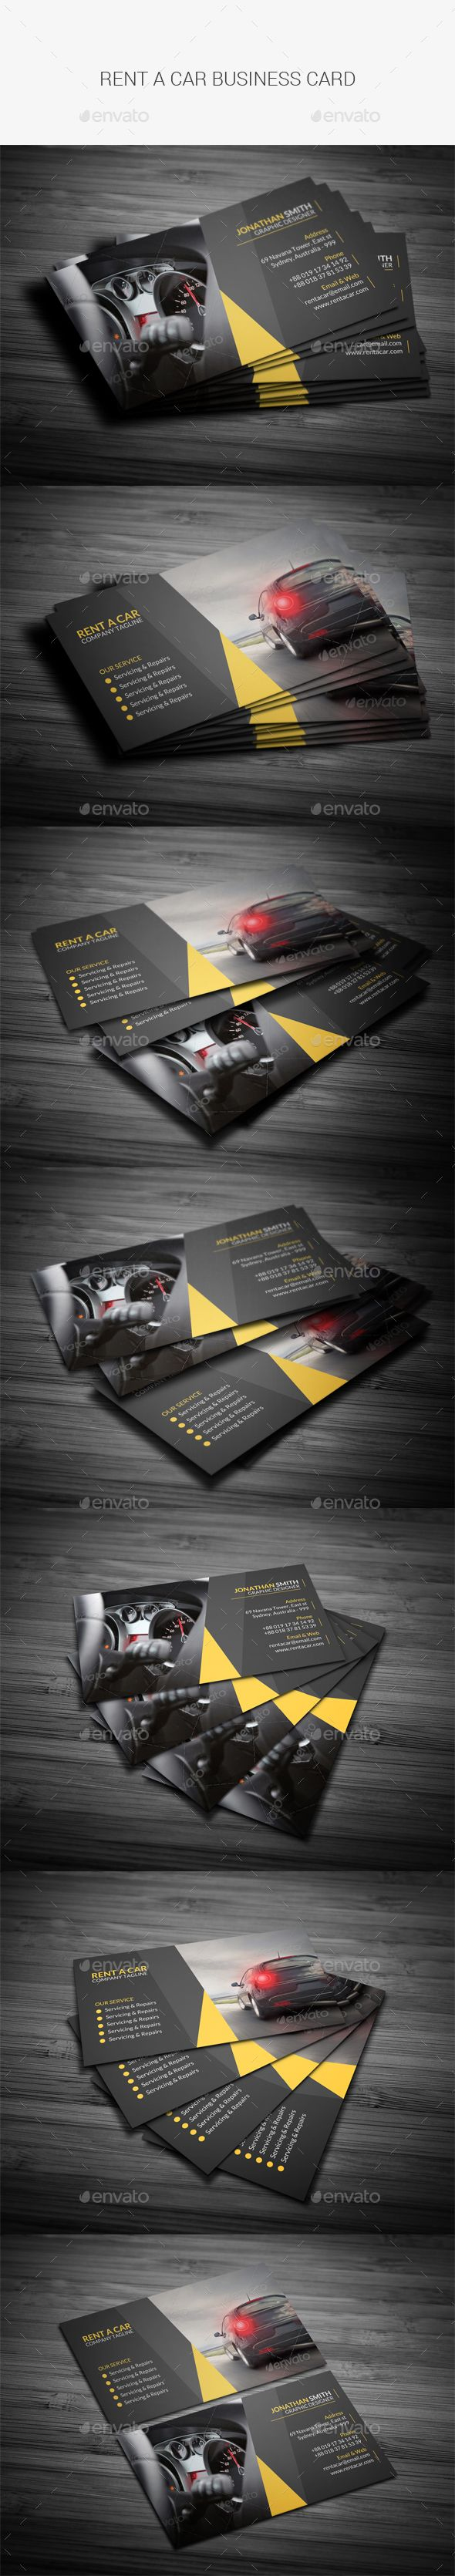 Rent A Car Business Card Template PSD #design Download: http://graphicriver.net/item/rent-a-car-business-card/13563843?ref=ksioks